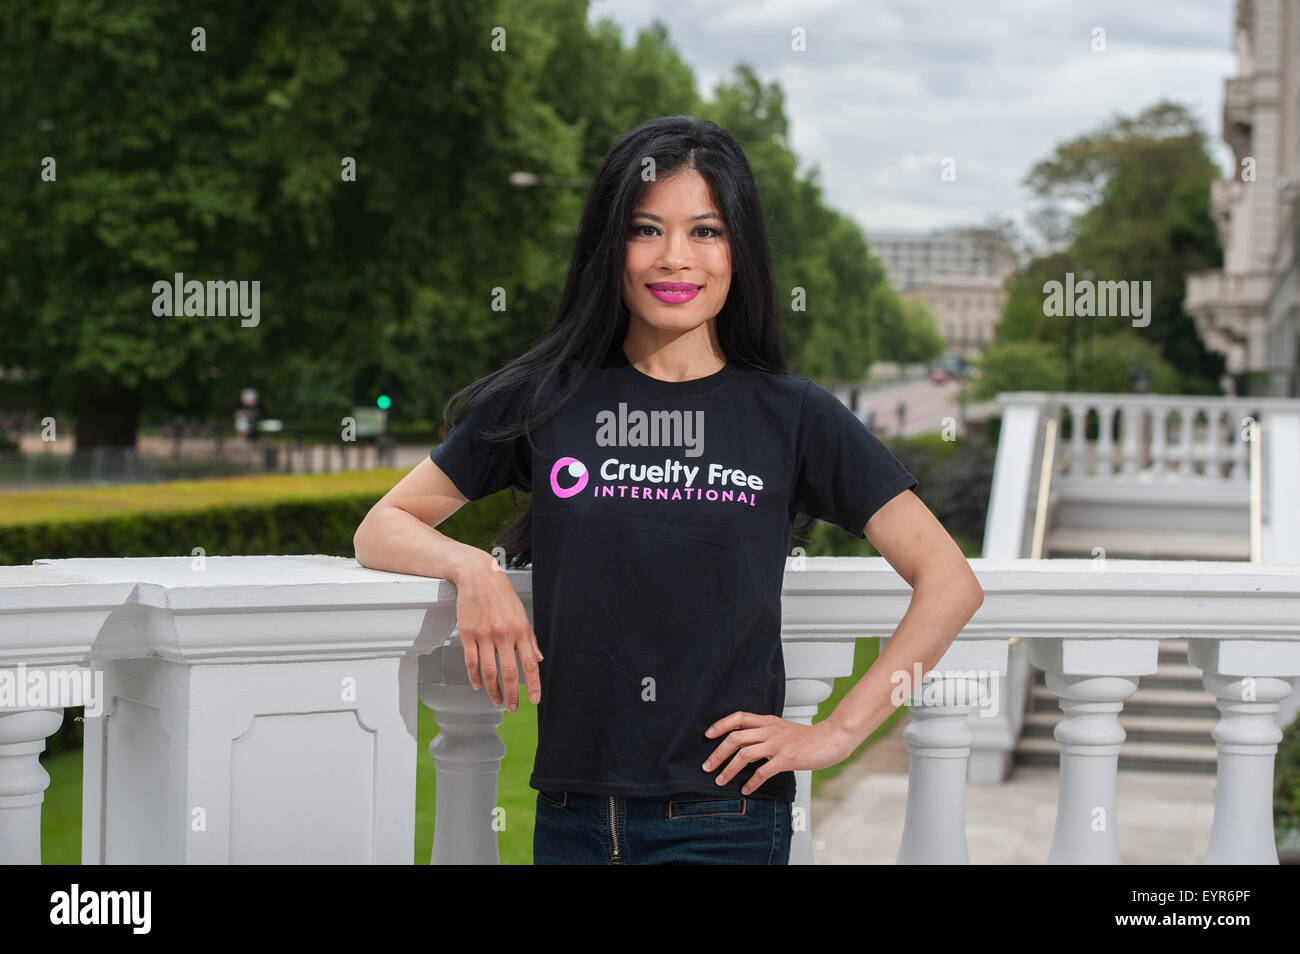 Vanessa Mae promotes Cruelty Free at the Mandarin Oriental.  Featuring: Vanessa Mae Where: London, United Kingdom Stock Photo